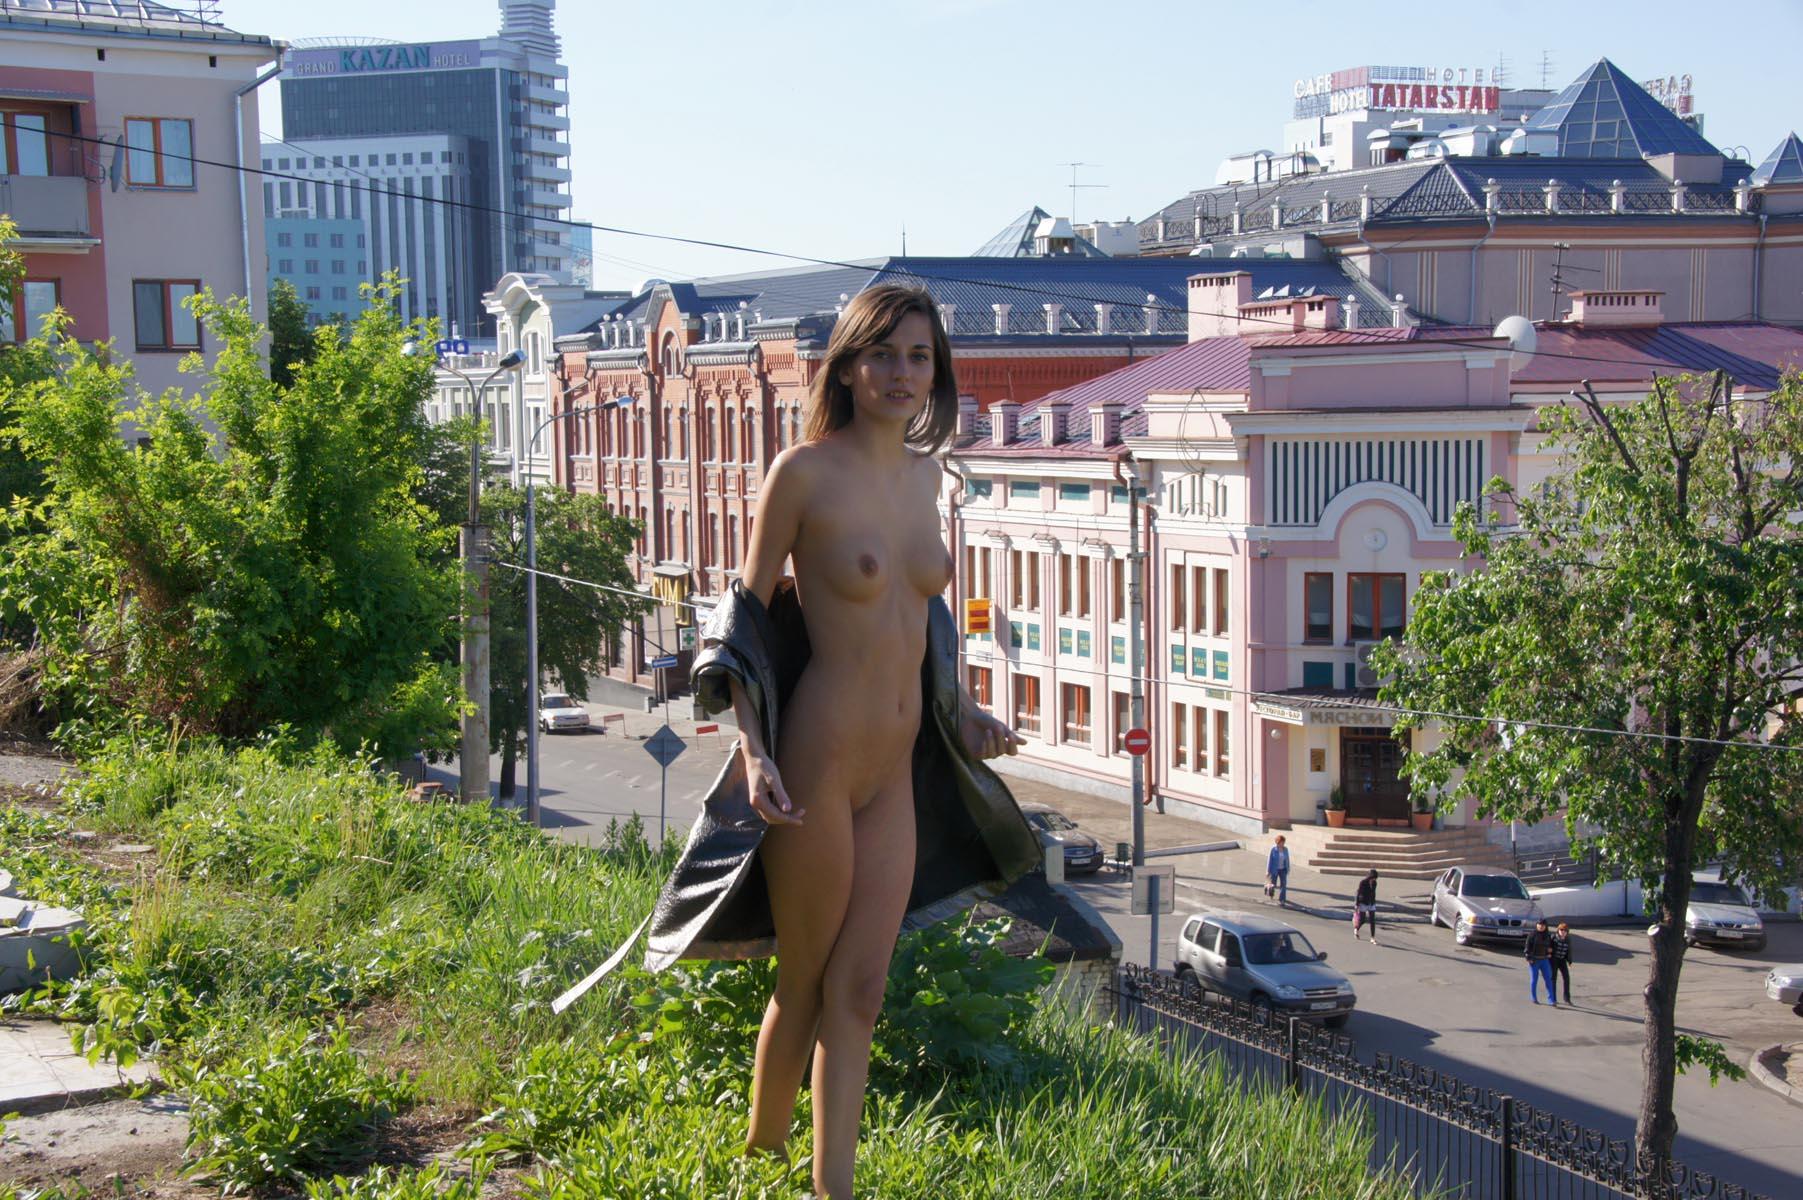 irina-k-naked-in-russia-kazan-nude-public-01